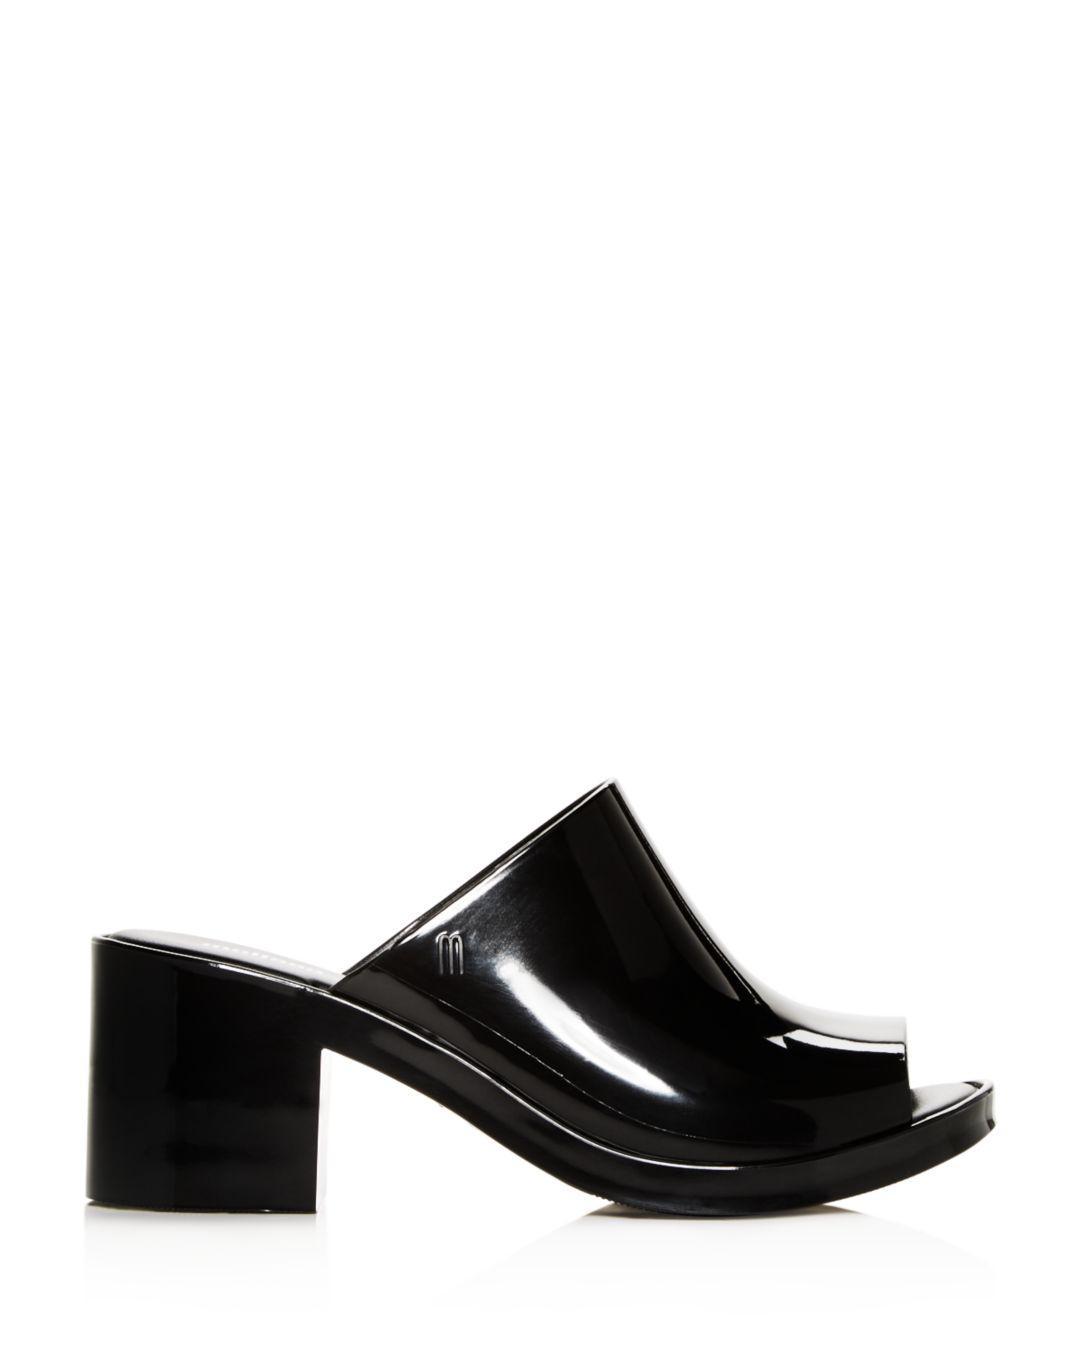 3da00265f95 Lyst - Melissa Women s Block-heel Slide Sandals in Black